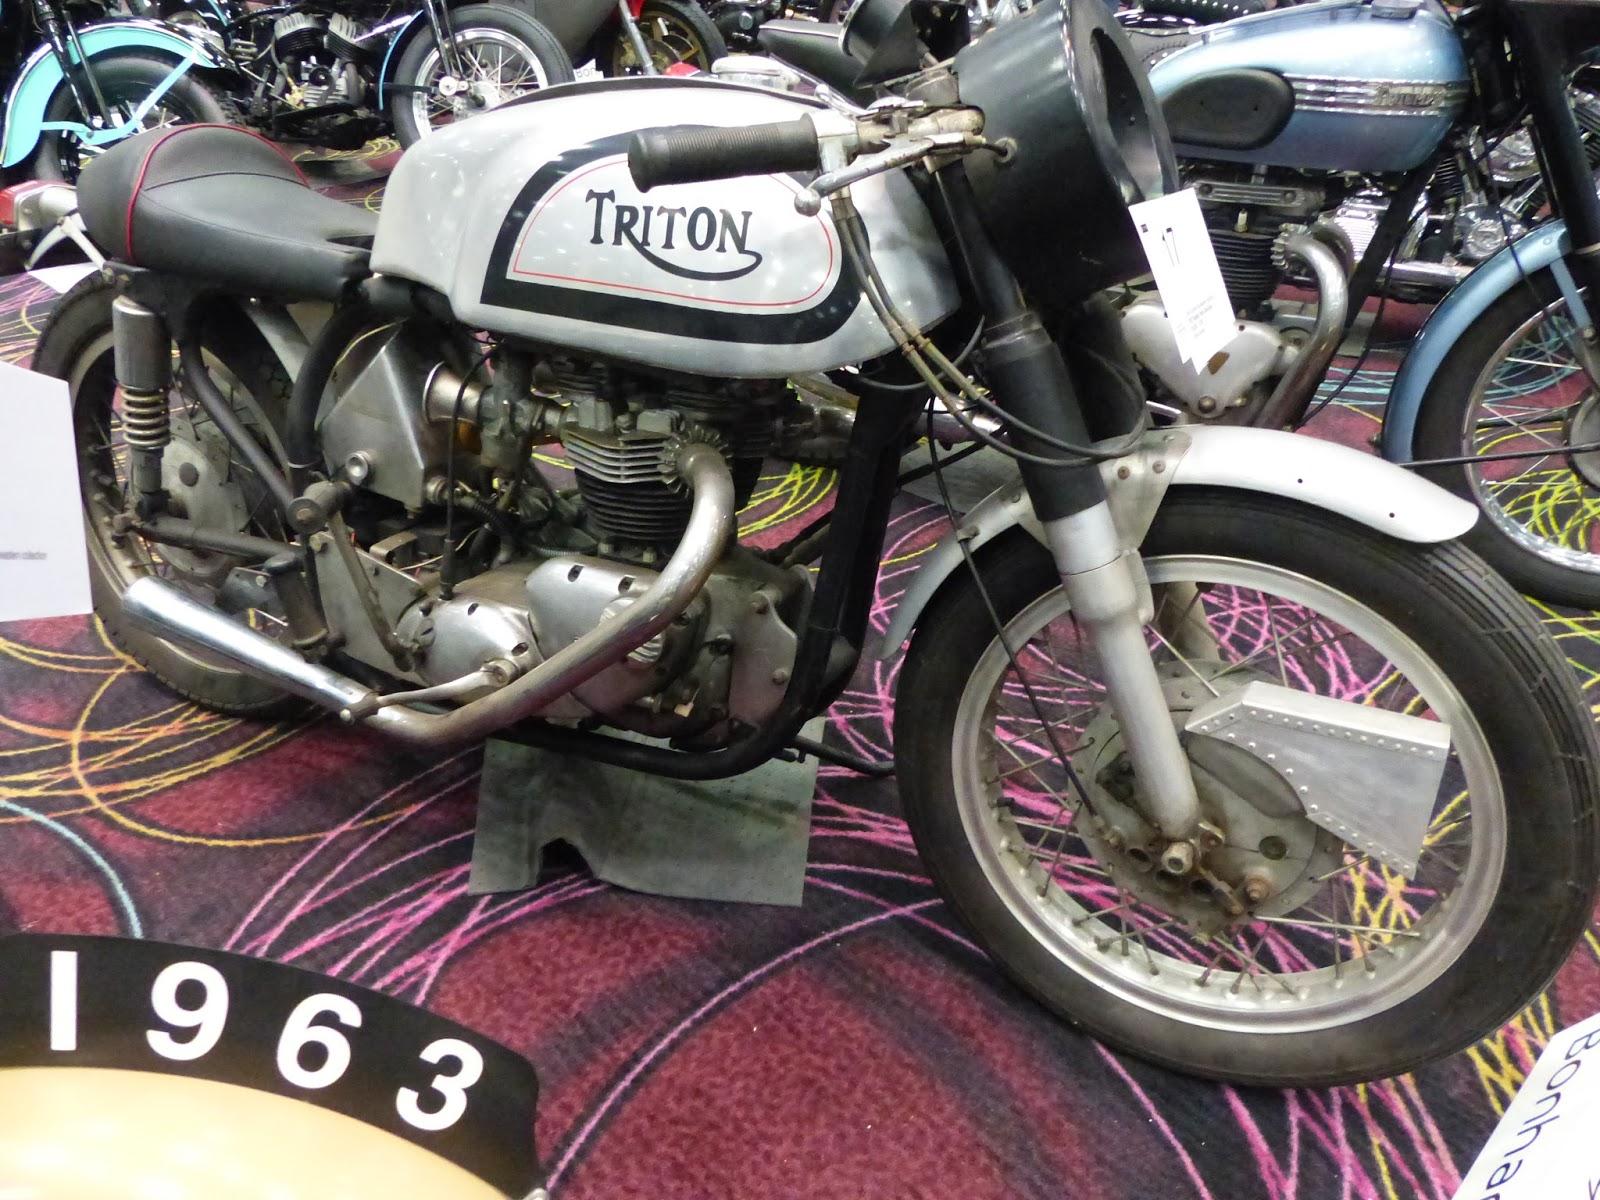 Evel Knievel Bike At Bonham S Las Vegas Moto Auction: OldMotoDude: 1972 Triumph Triton Sold For $8,900 At The